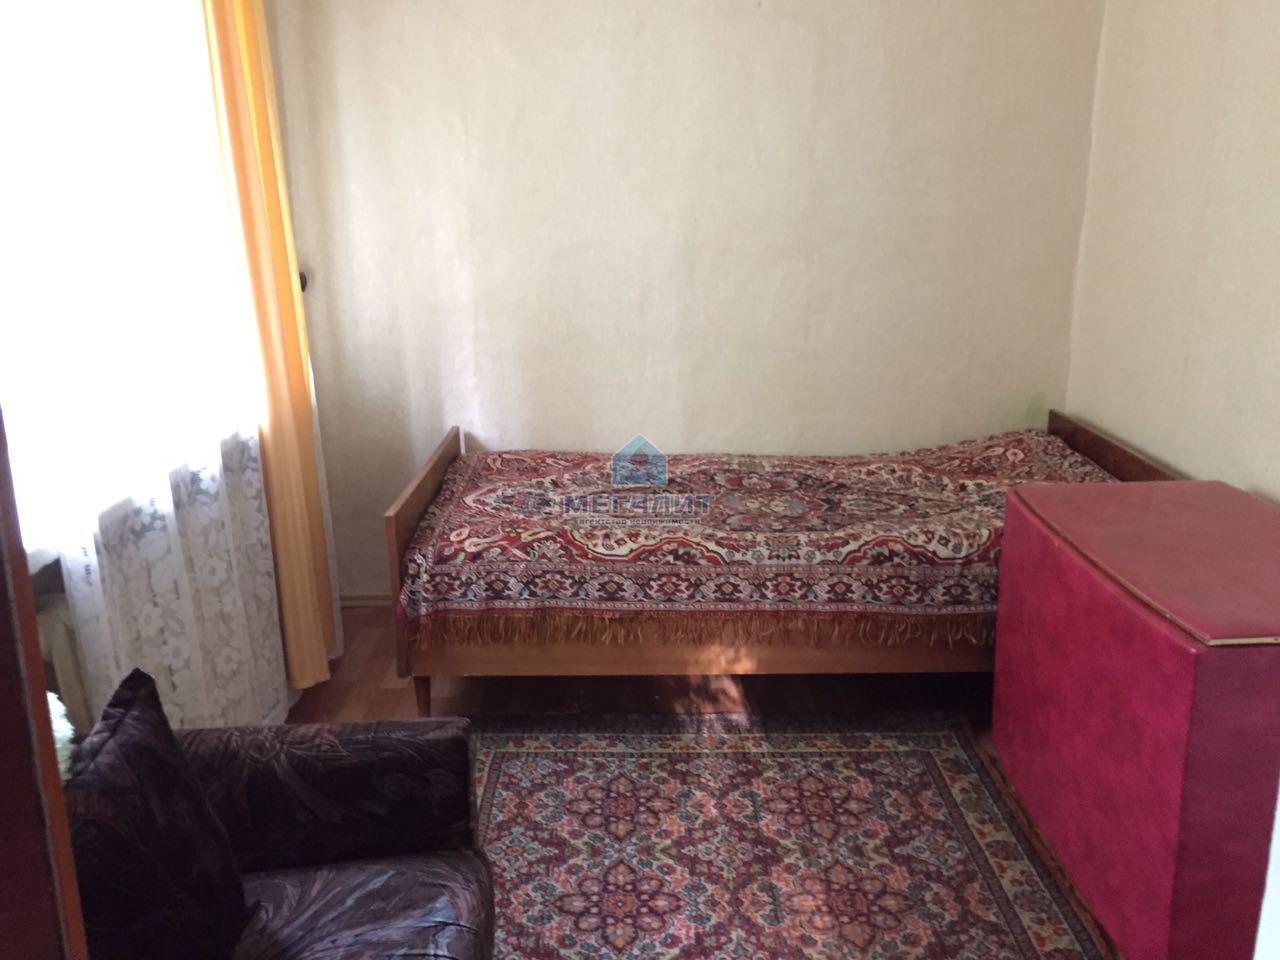 Аренда 2-к квартиры Восстания 93, 42.0 м² (миниатюра №8)